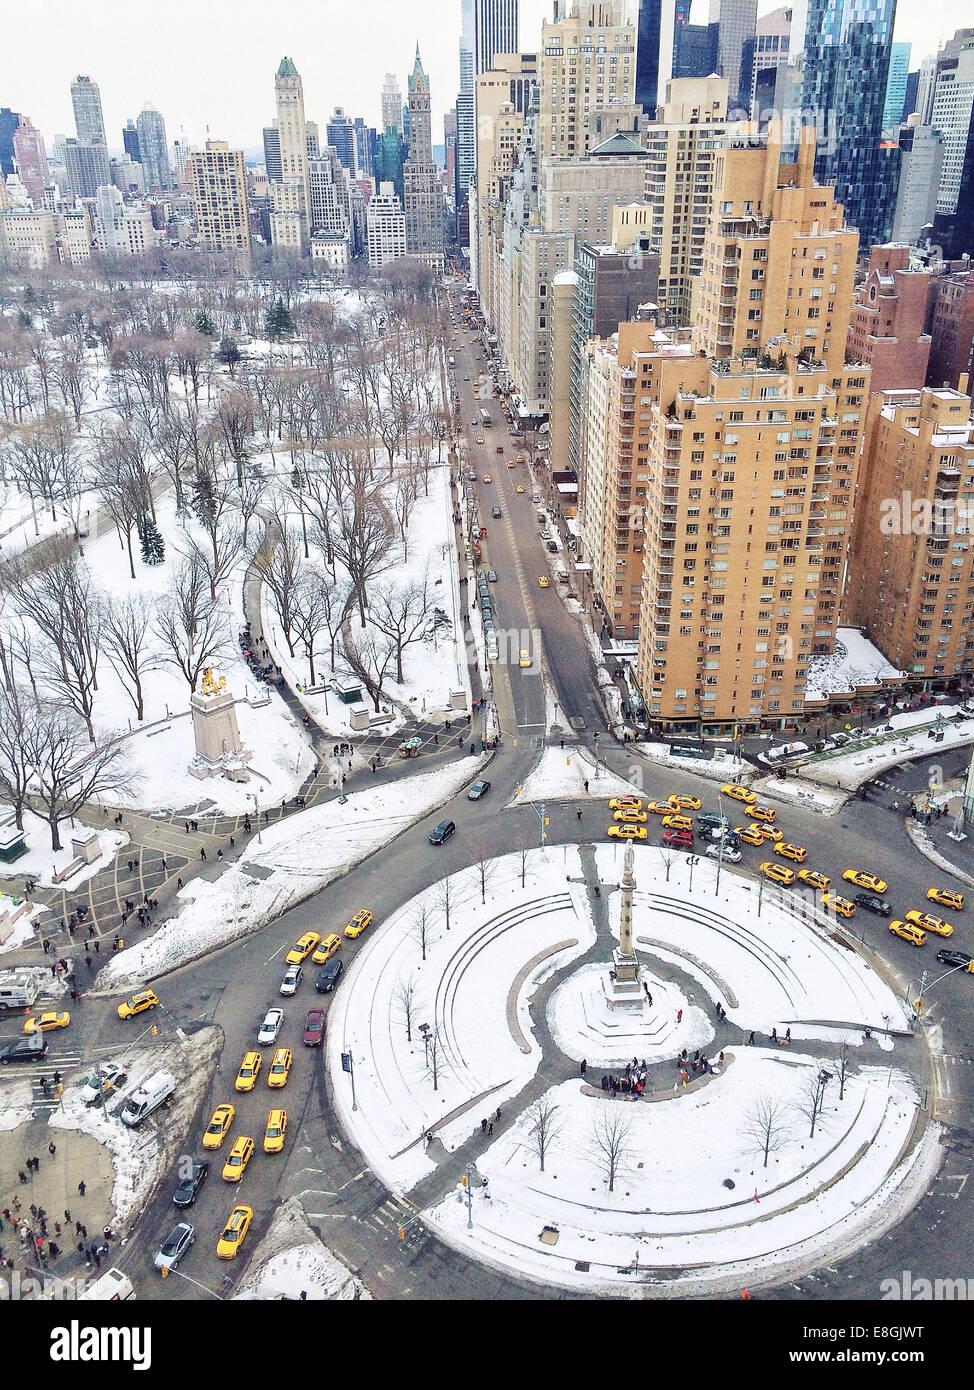 Vue aérienne de Columbus Circle, Manhattan, New York, Amérique, USA Photo Stock